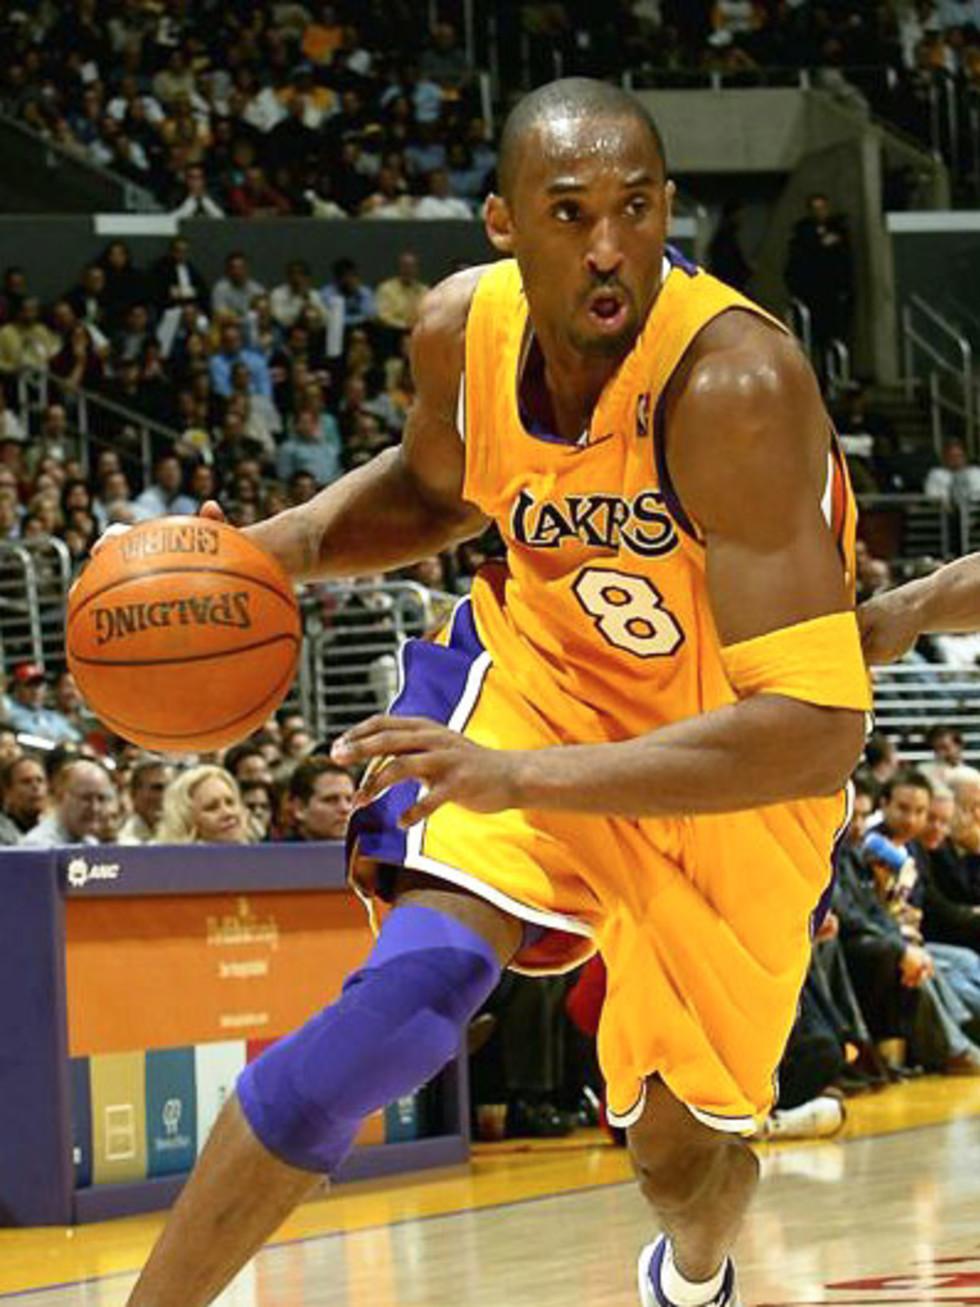 News_Kobe Bryant_basketball player_Lakers_basketball